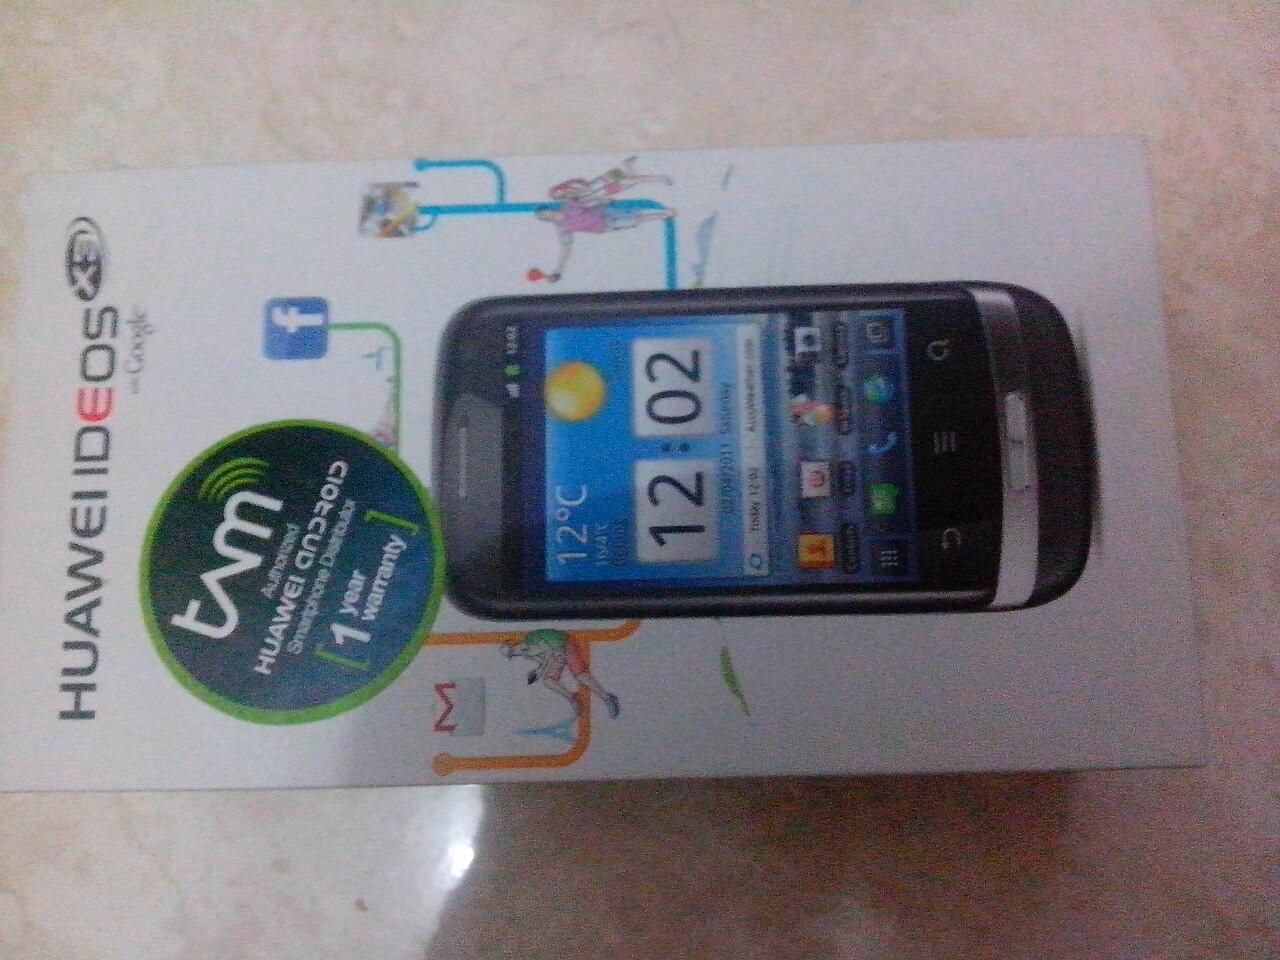 Huawei Ideos X3 2nd murah, masih mulus banget[Bandung]